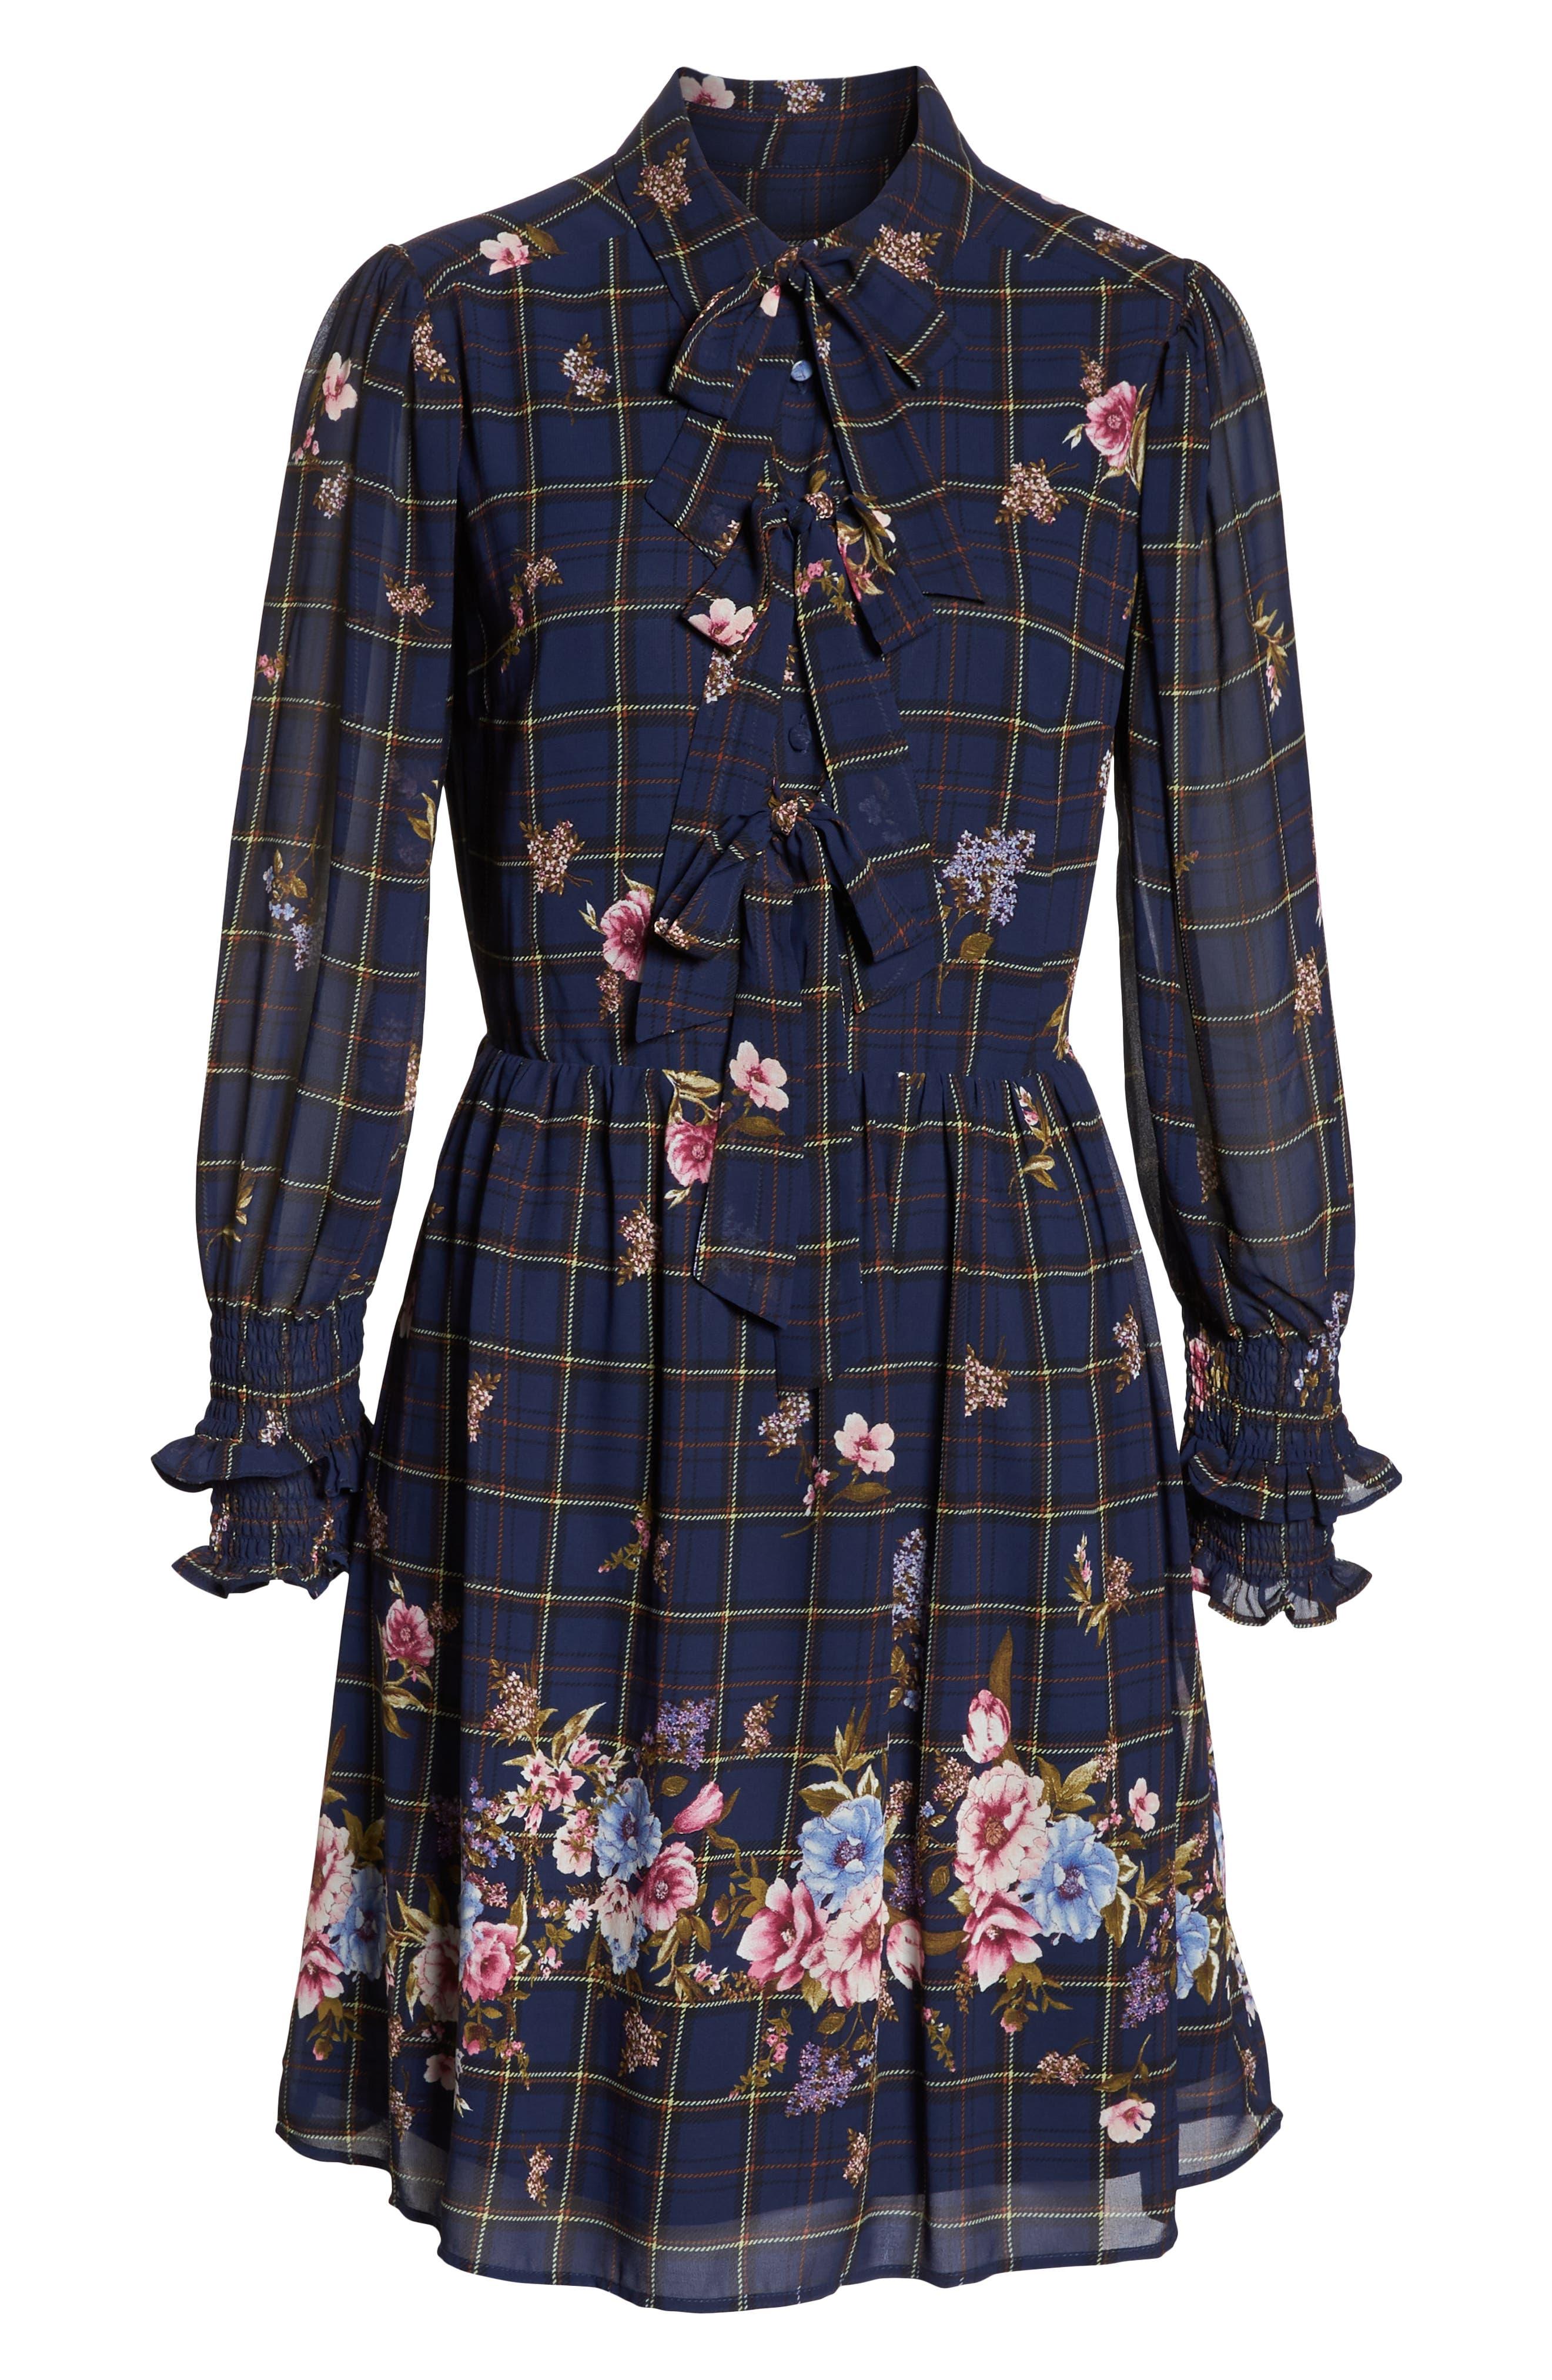 Three-Bow Long Sleeve Dress,                             Alternate thumbnail 7, color,                             NAVY PLAID FLORAL